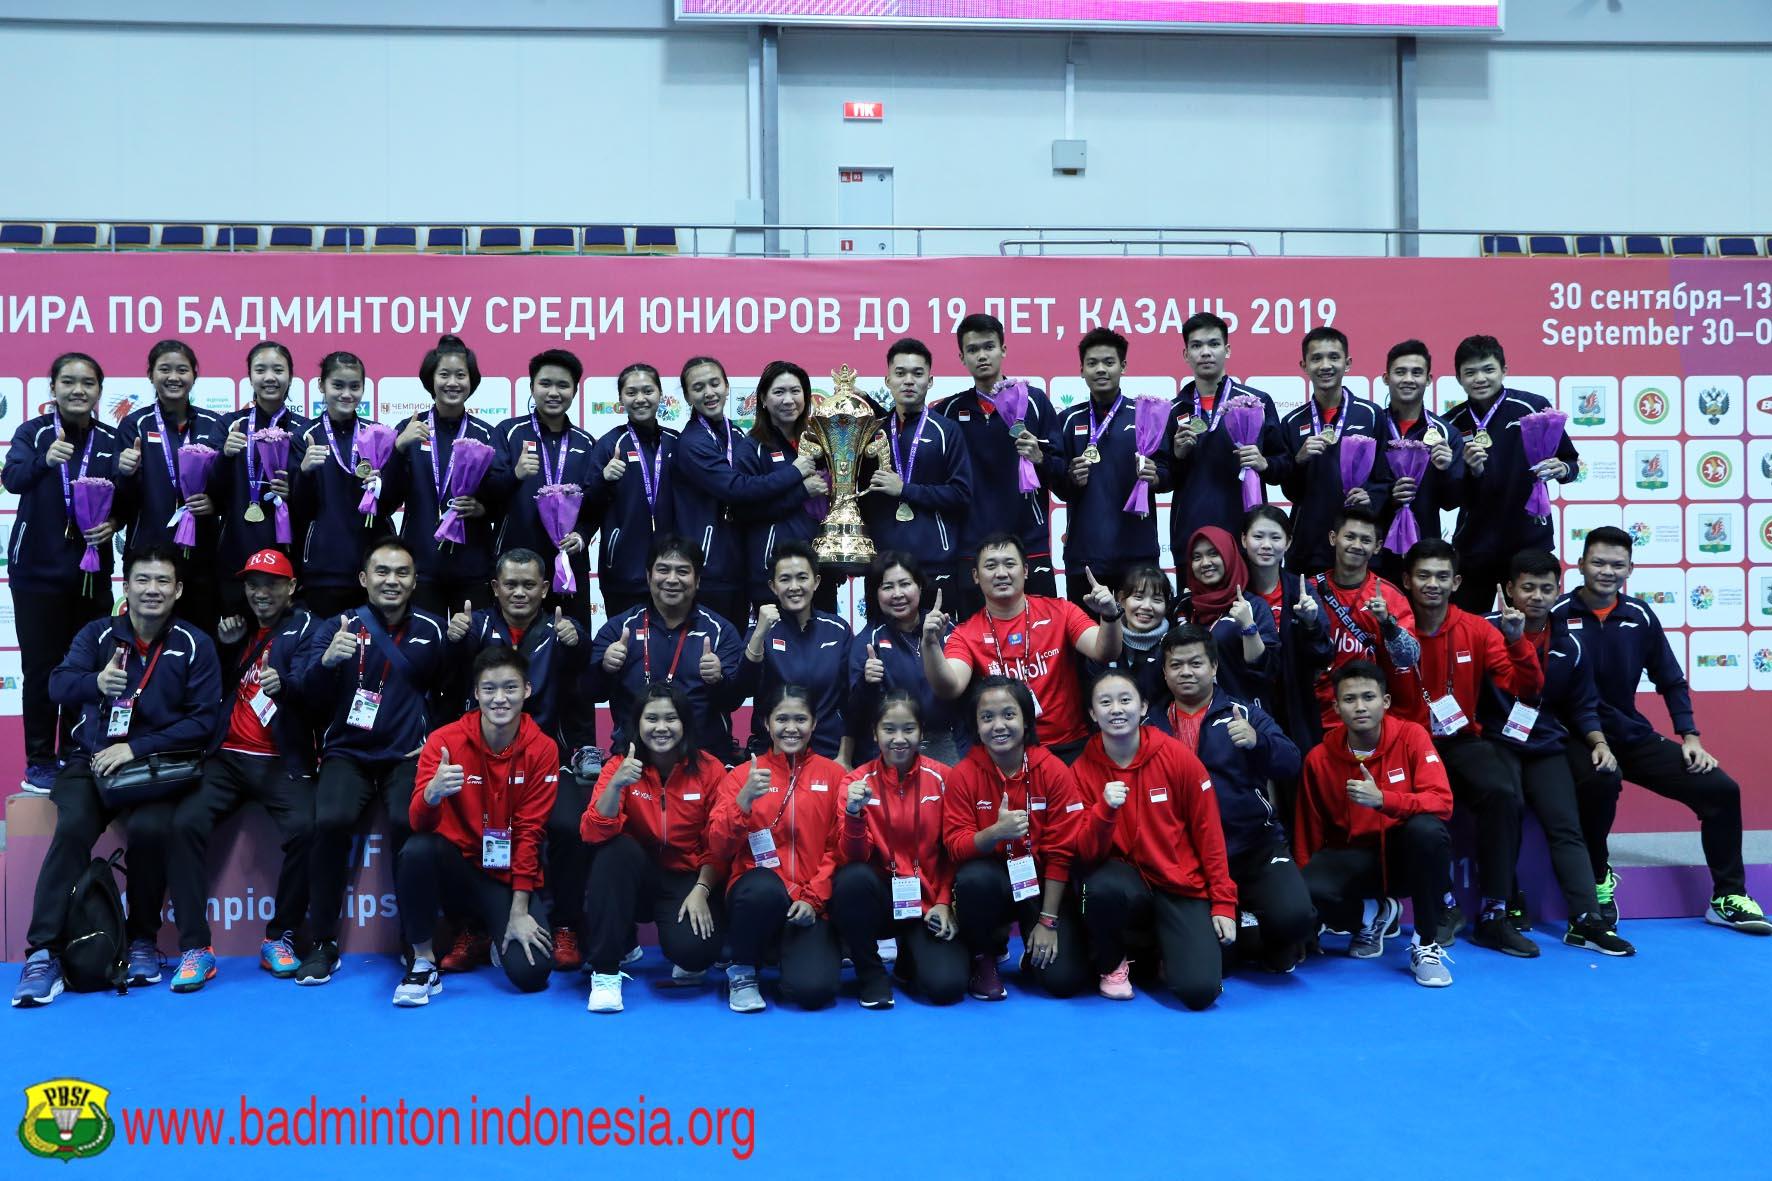 https: img-o.okeinfo.net content 2019 10 18 40 2118795 bersinar-di-kejuaraan-bulu-tangkis-junior-2019-indonesia-terima-penghargaan-iGfU8tQmZ9.jpg